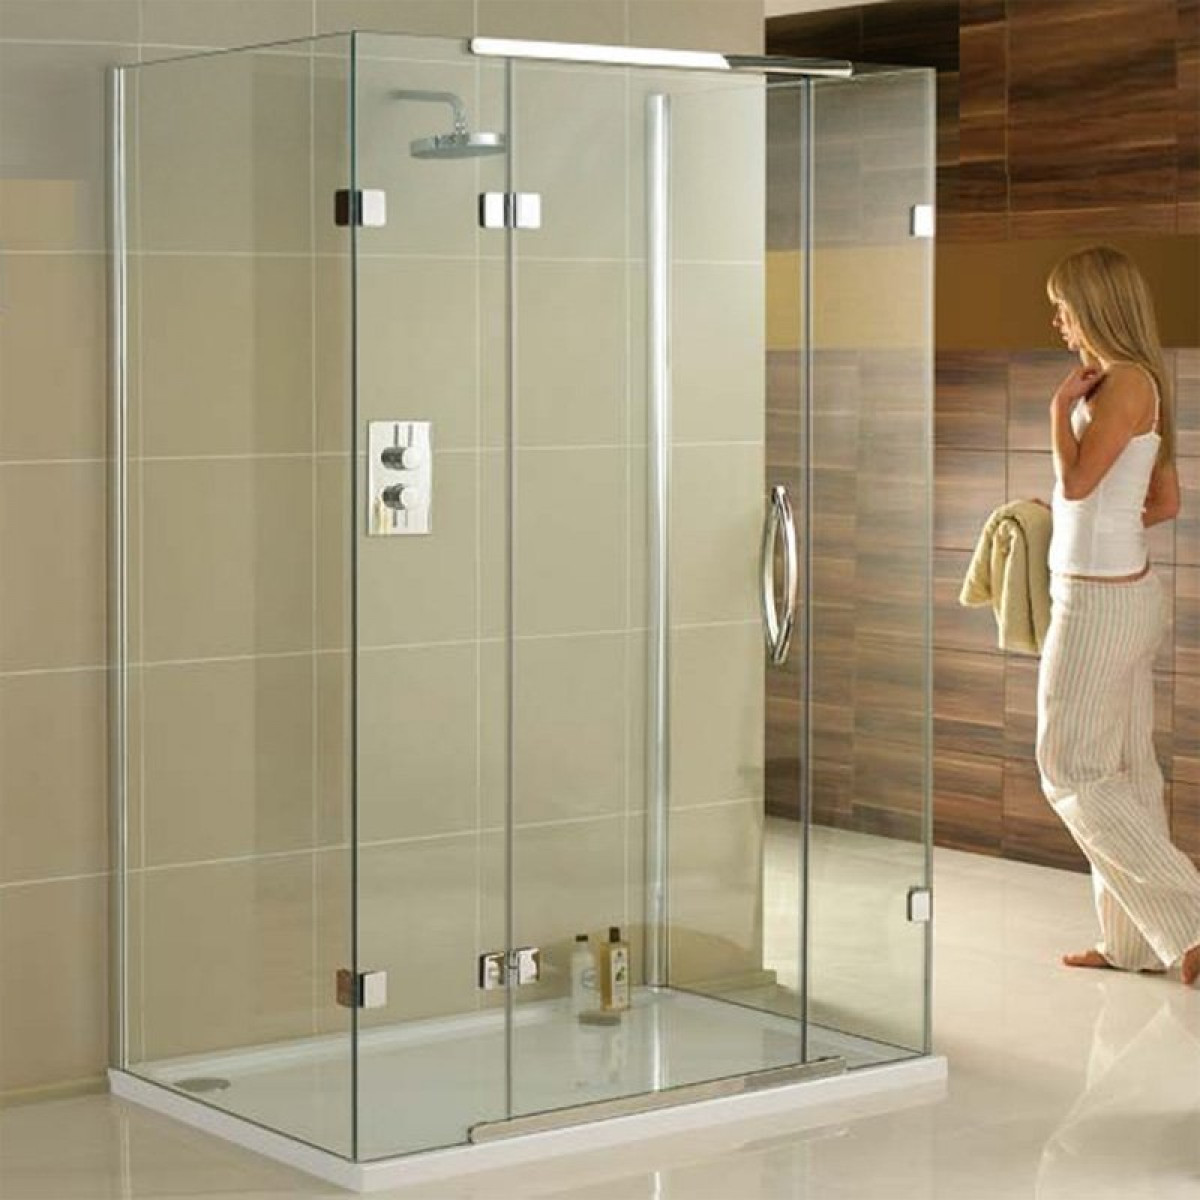 Aquadart 1400 x 900mm 3 Sided Shower Enclosure | AQ1032